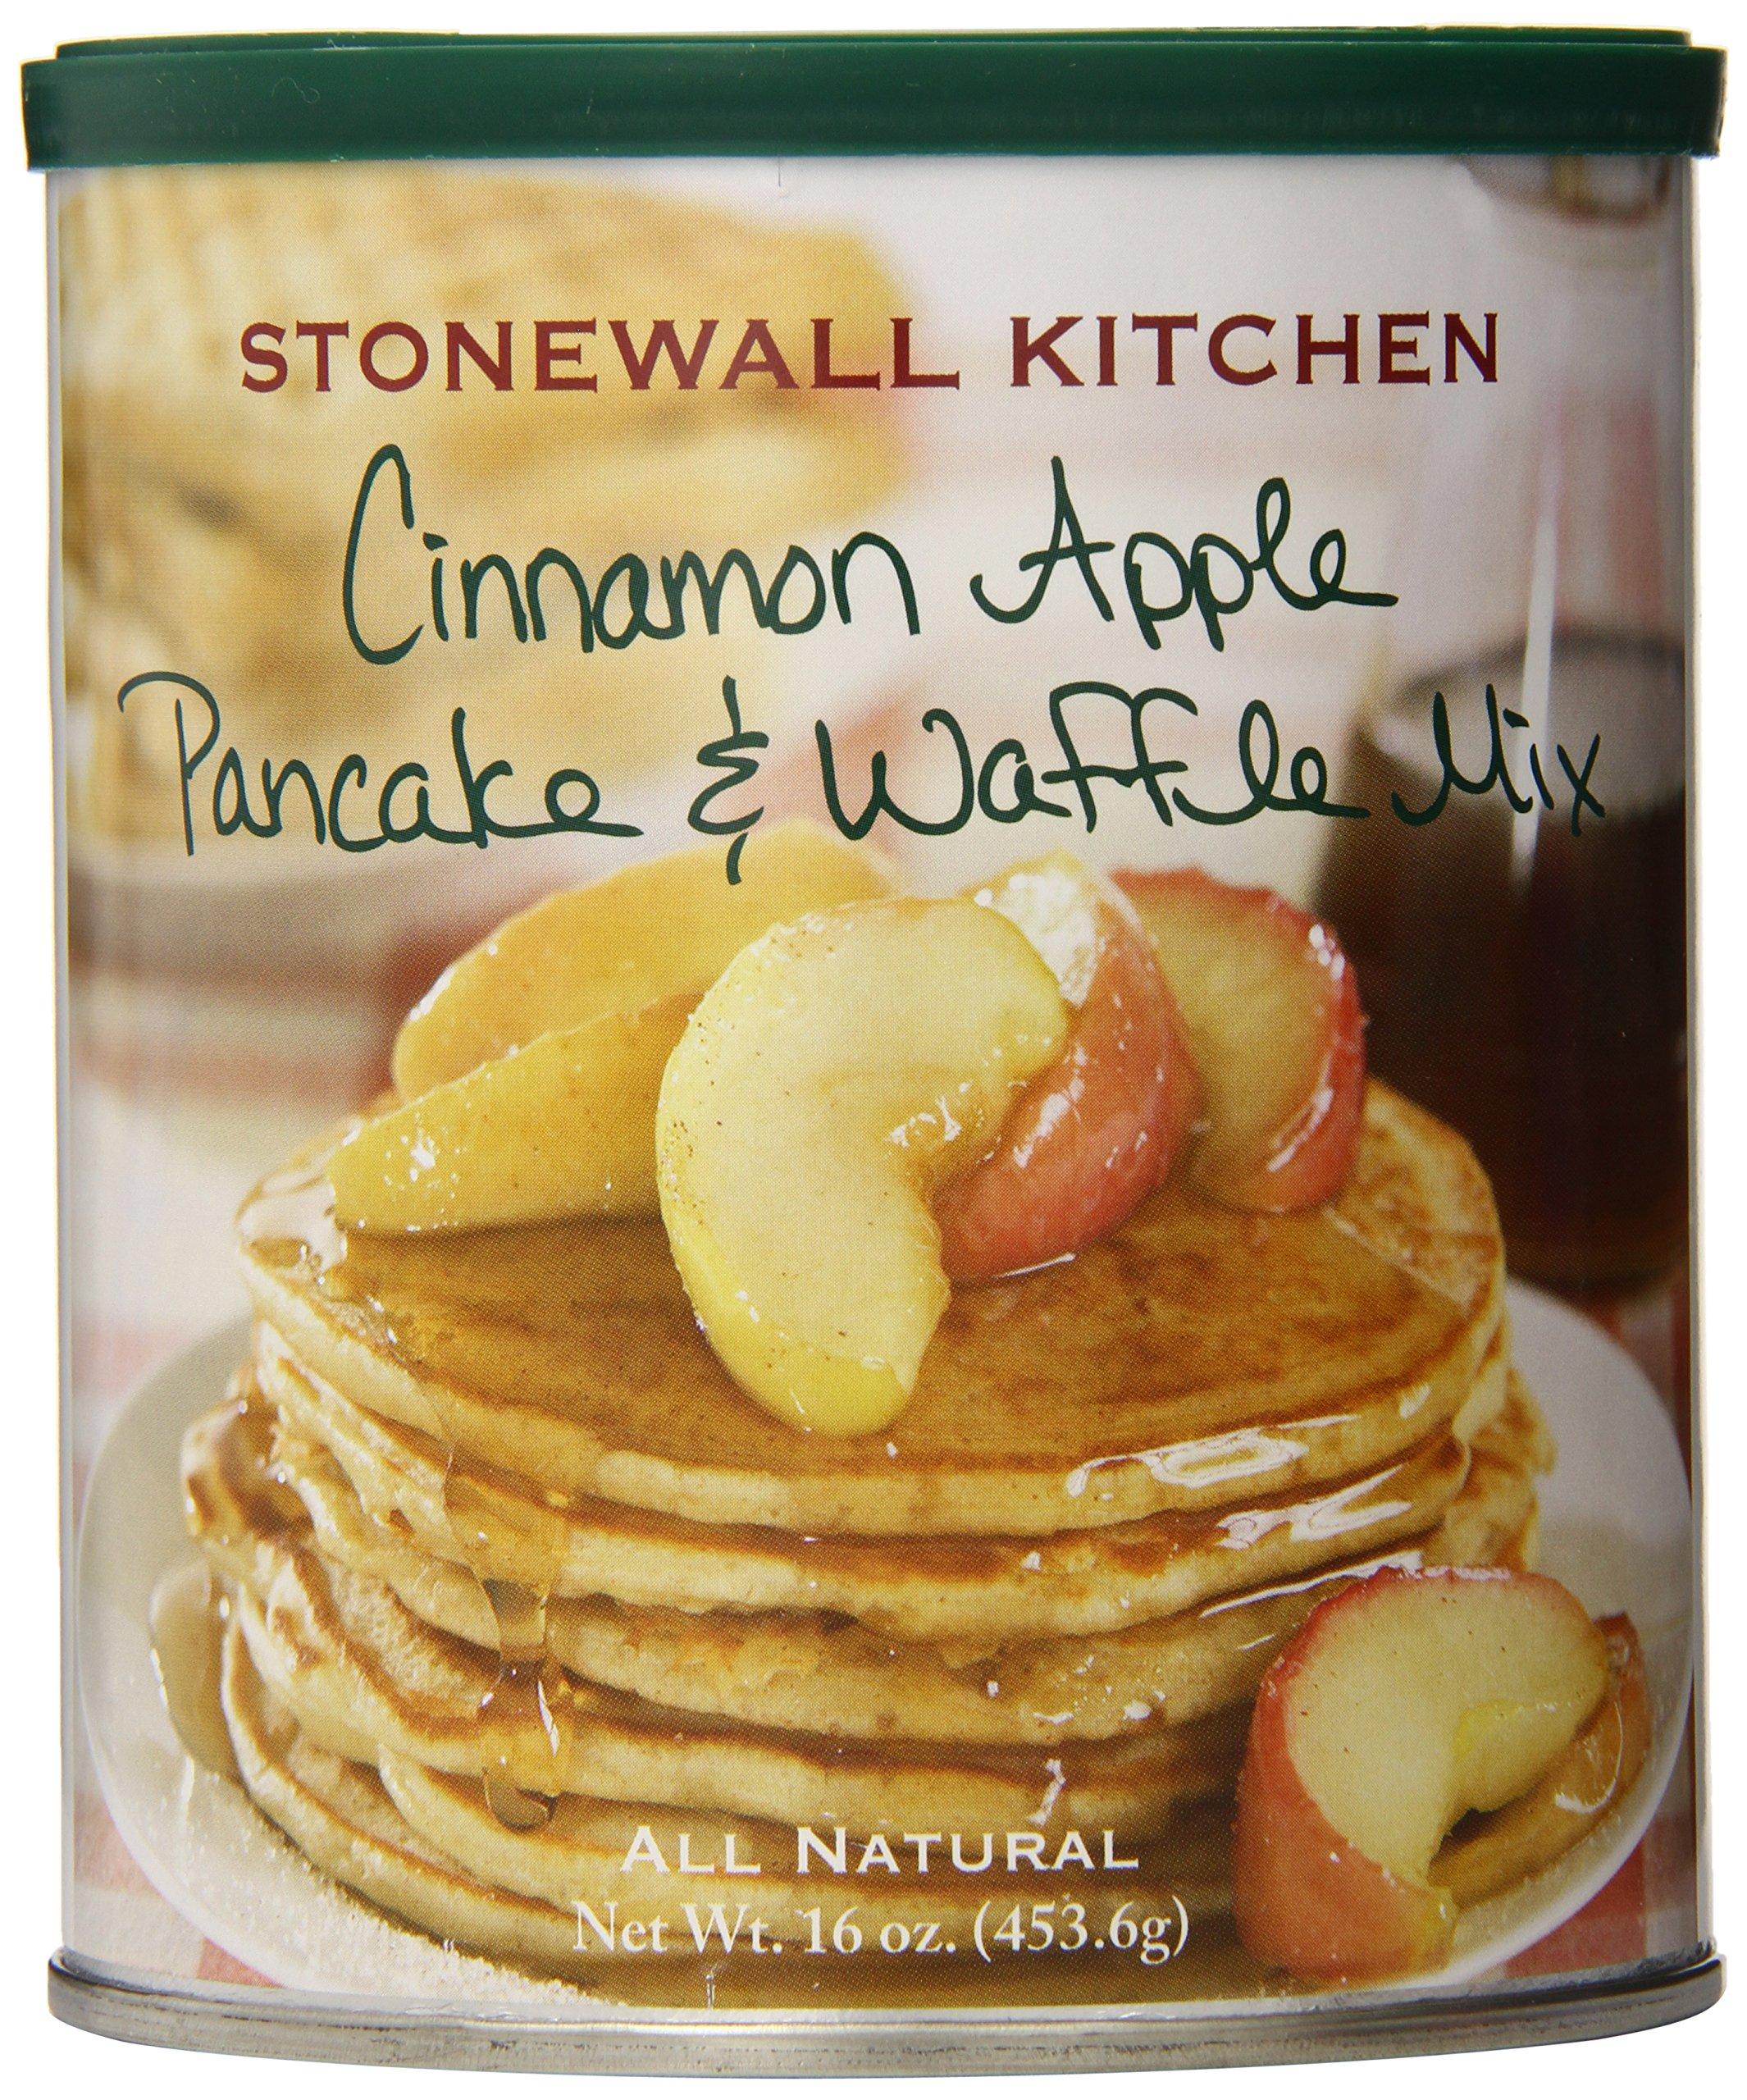 Amazon.com : Stonewall Kitchen Gingerbread Pancake